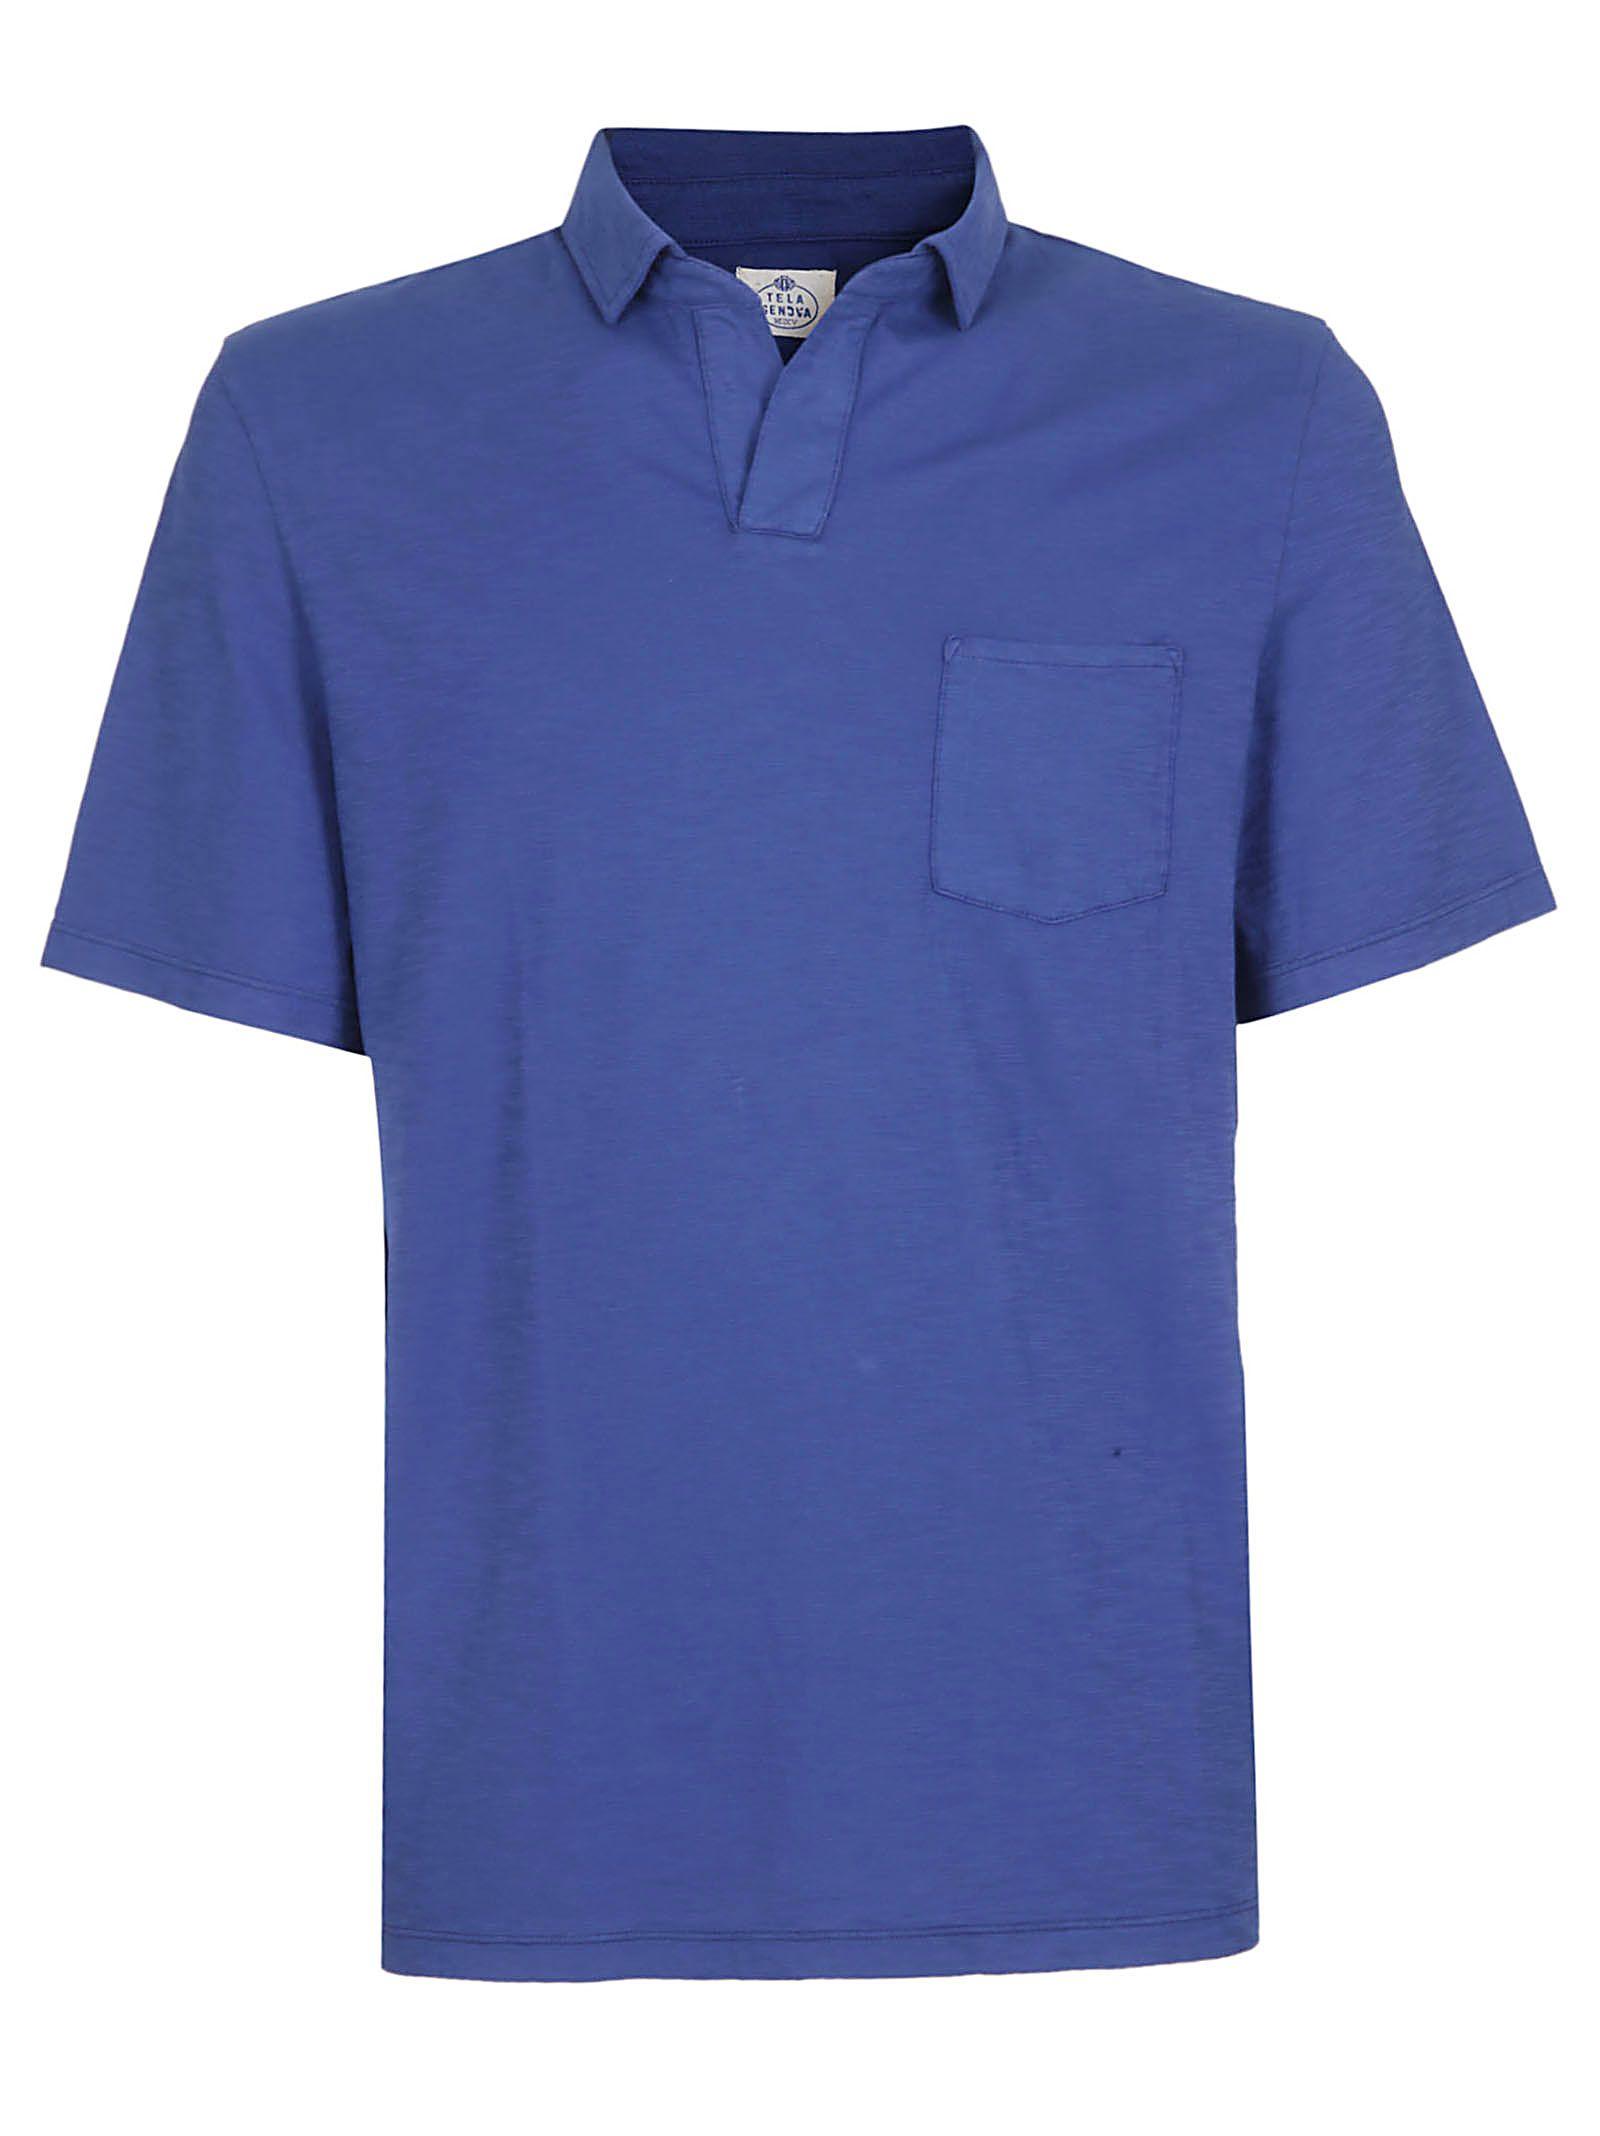 Tela Genova Johnny Collar Polo Shirt